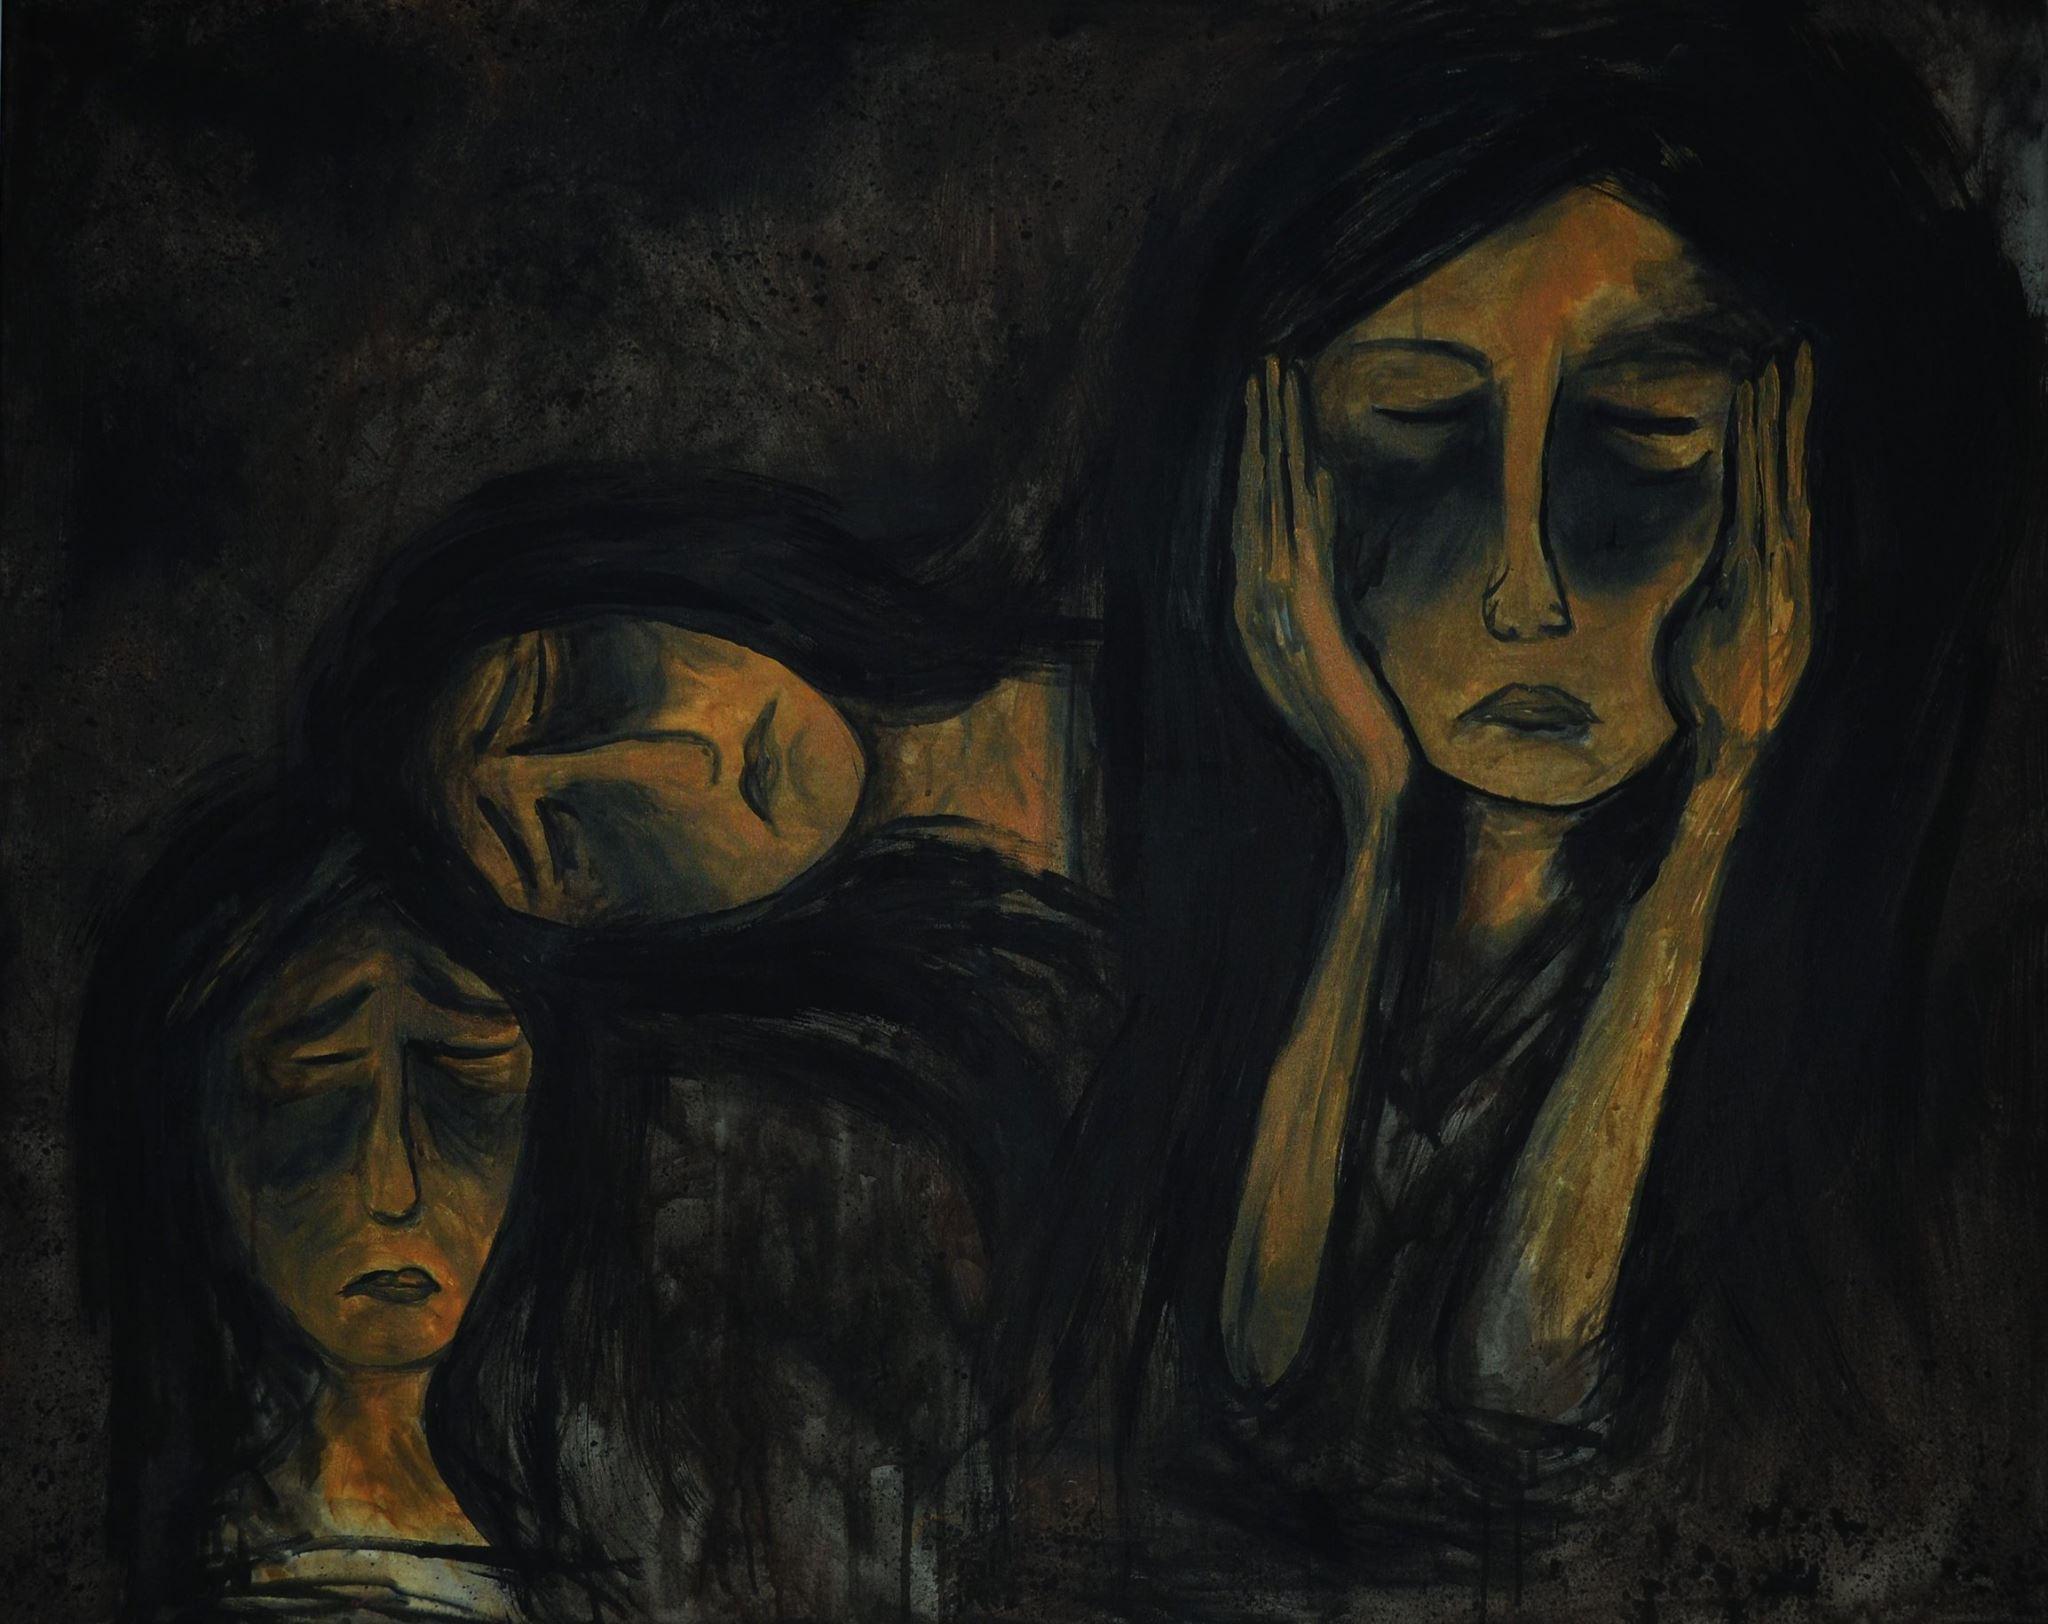 Gedankenwelt (2017). 100 x 80 cm.